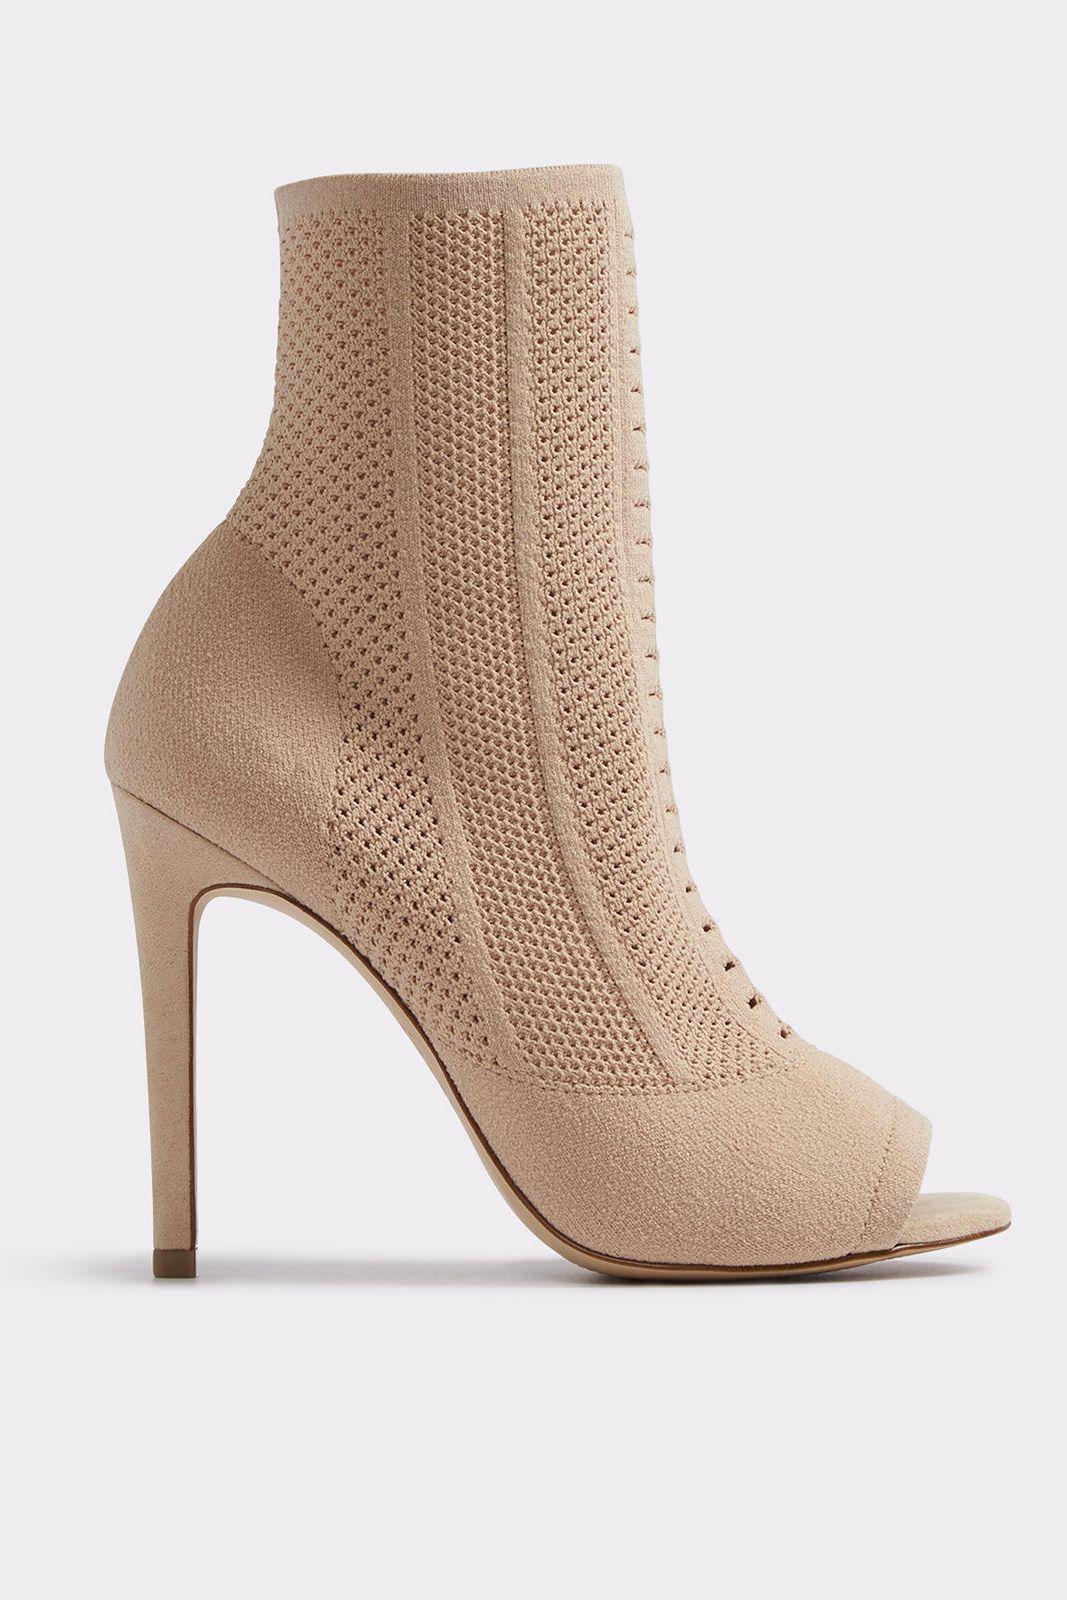 Aldo Keshaa Boots, $110